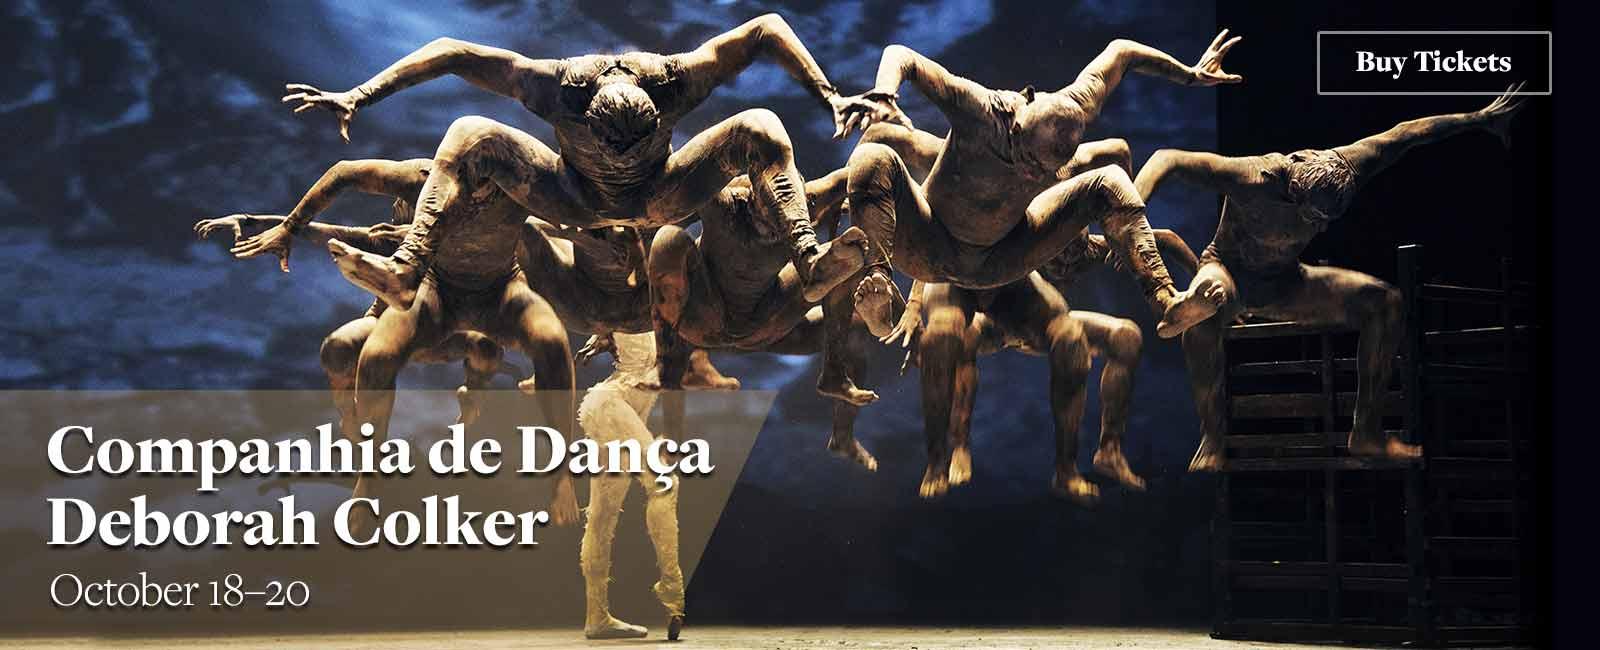 Companhia de Danca Deborah Colker